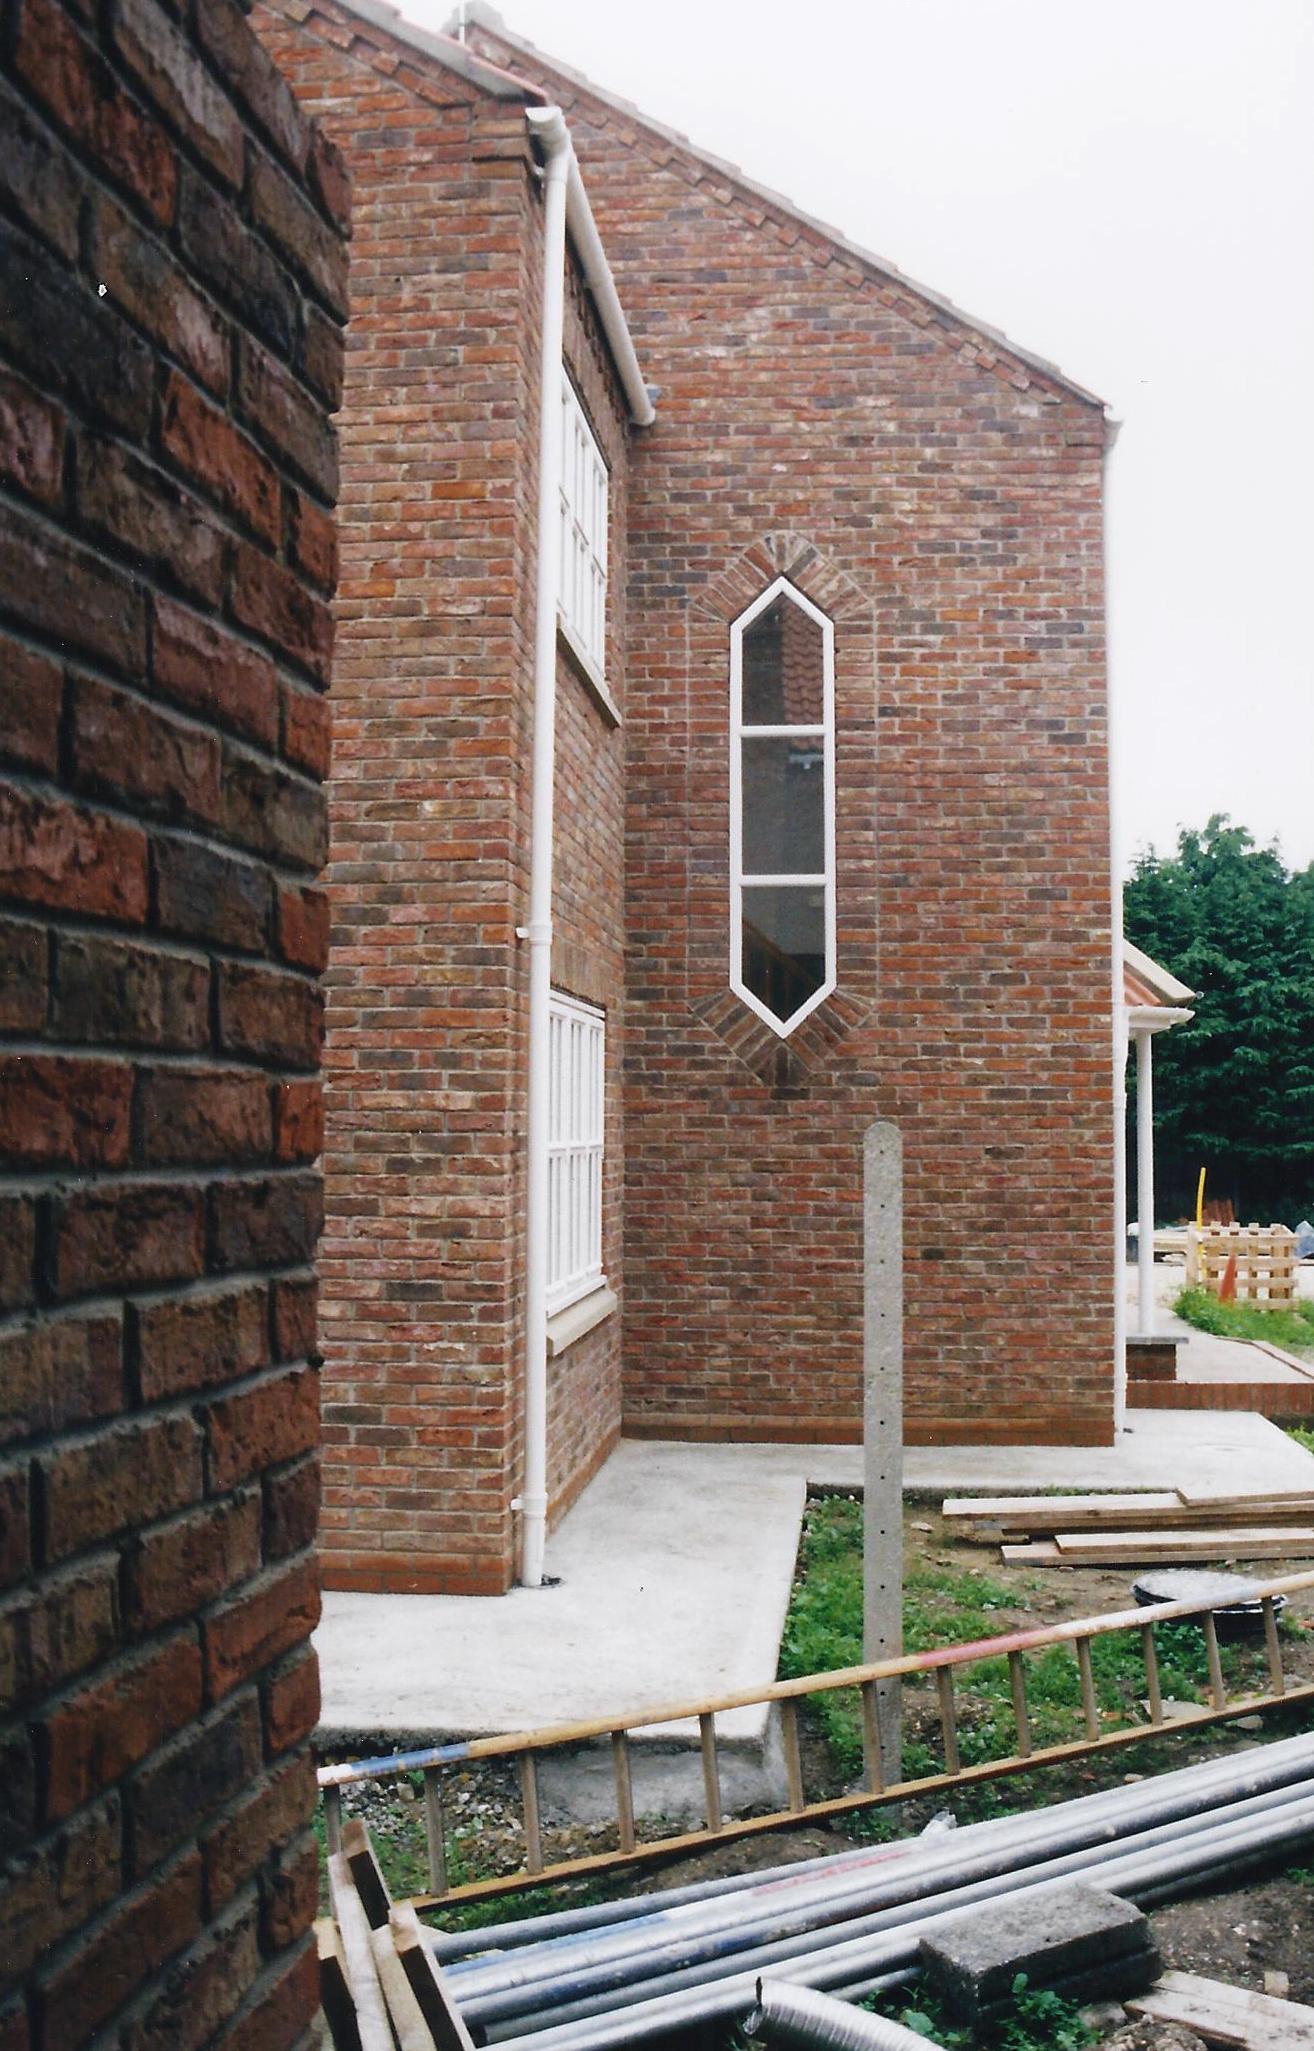 Blenheim Cottage Construction 3 - East Yorkshire Architects - Samuel Kendall Associates.jpg